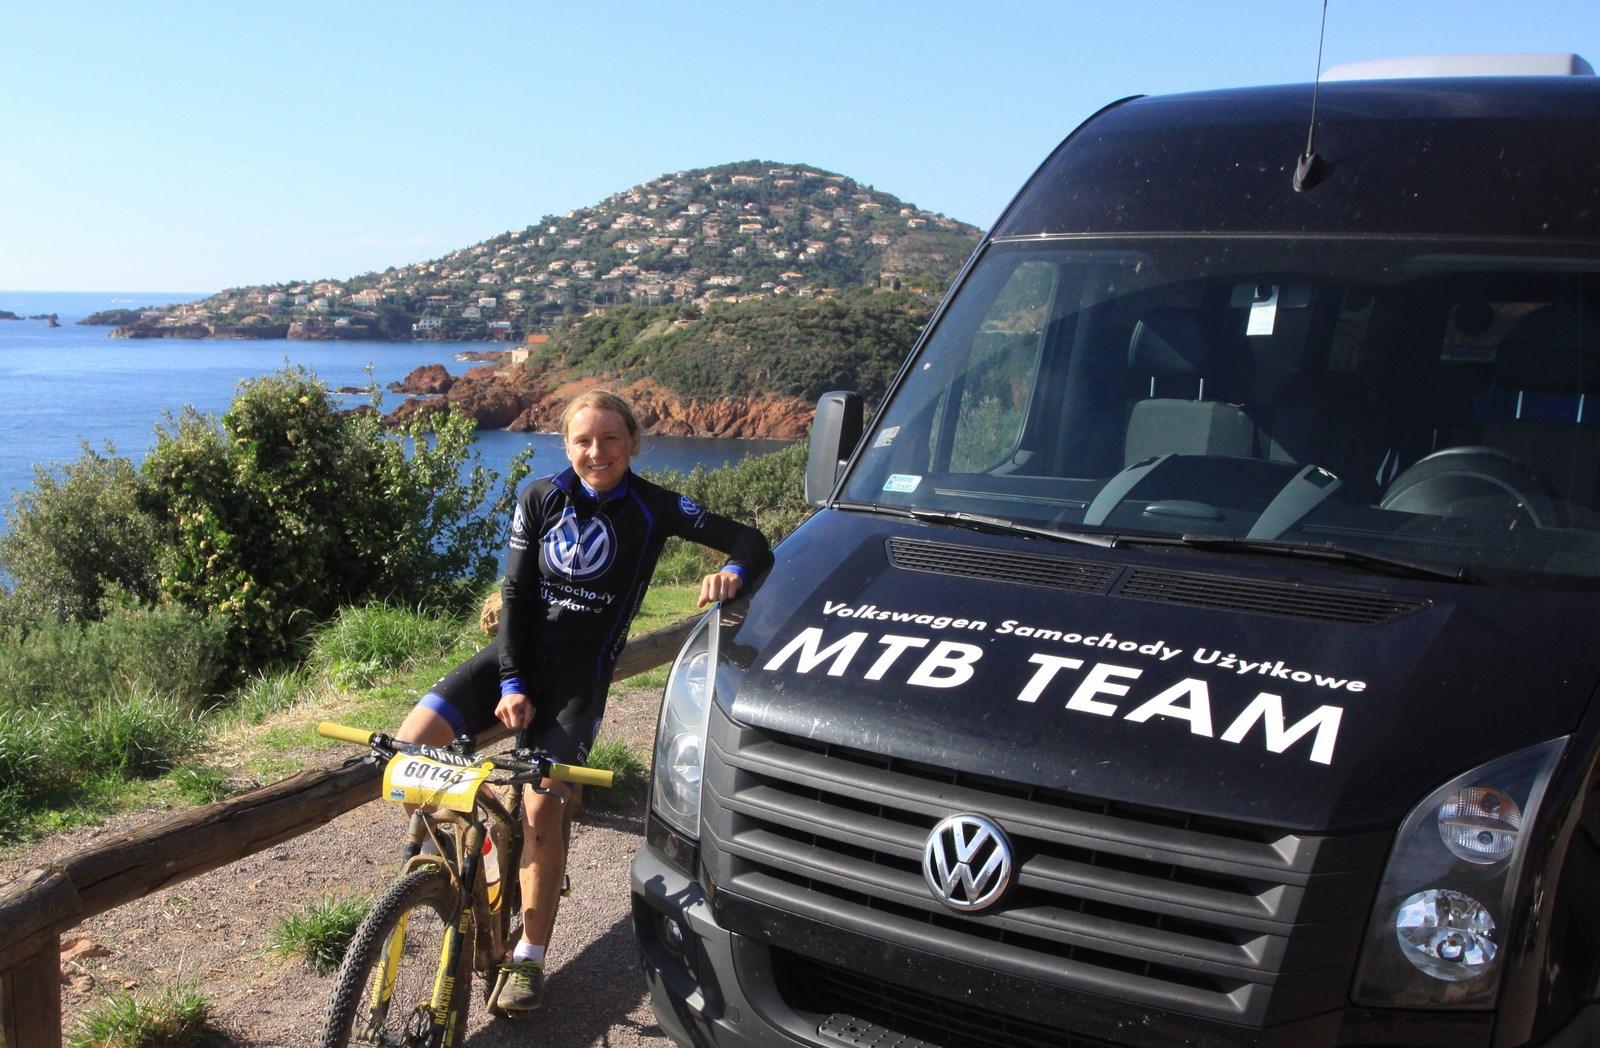 Michalina Ziółkowska (Volkswagen Samochody Użytkowe MTB) – Roc D'Azur – Frejus